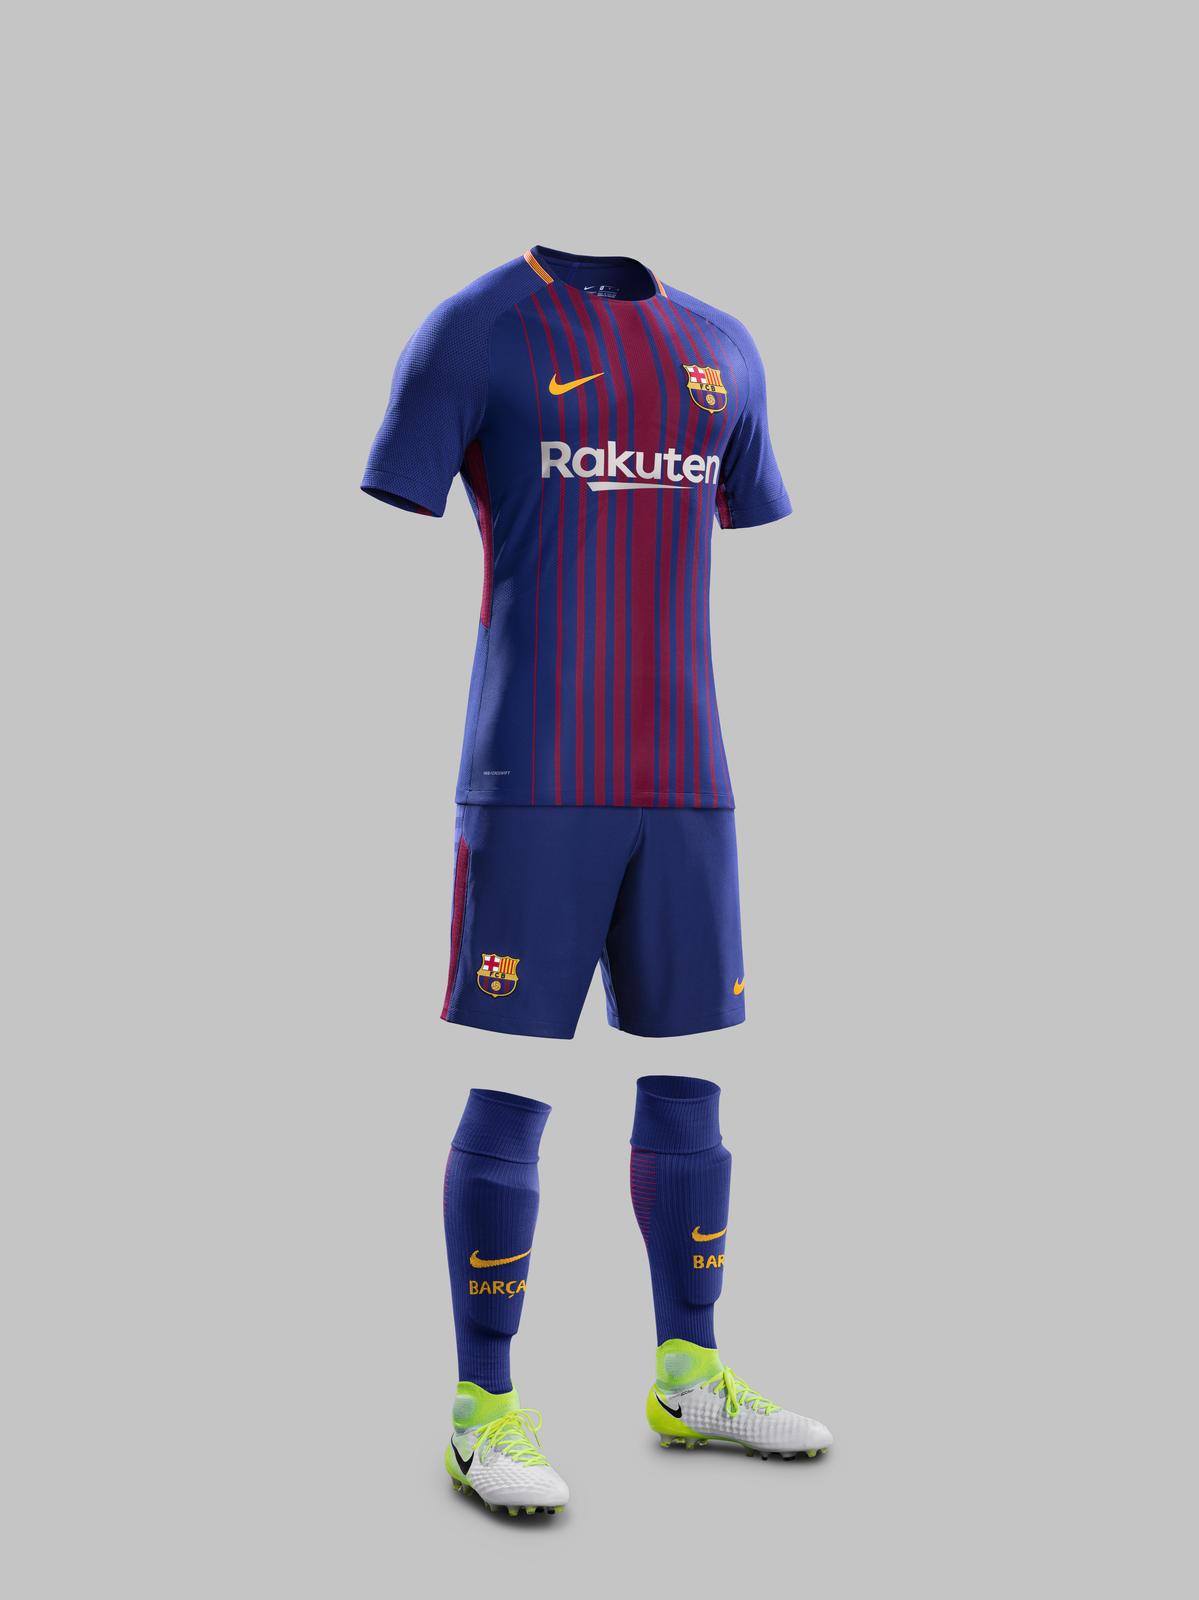 FC Barcelona Home Kit 2017-18 - Nike News